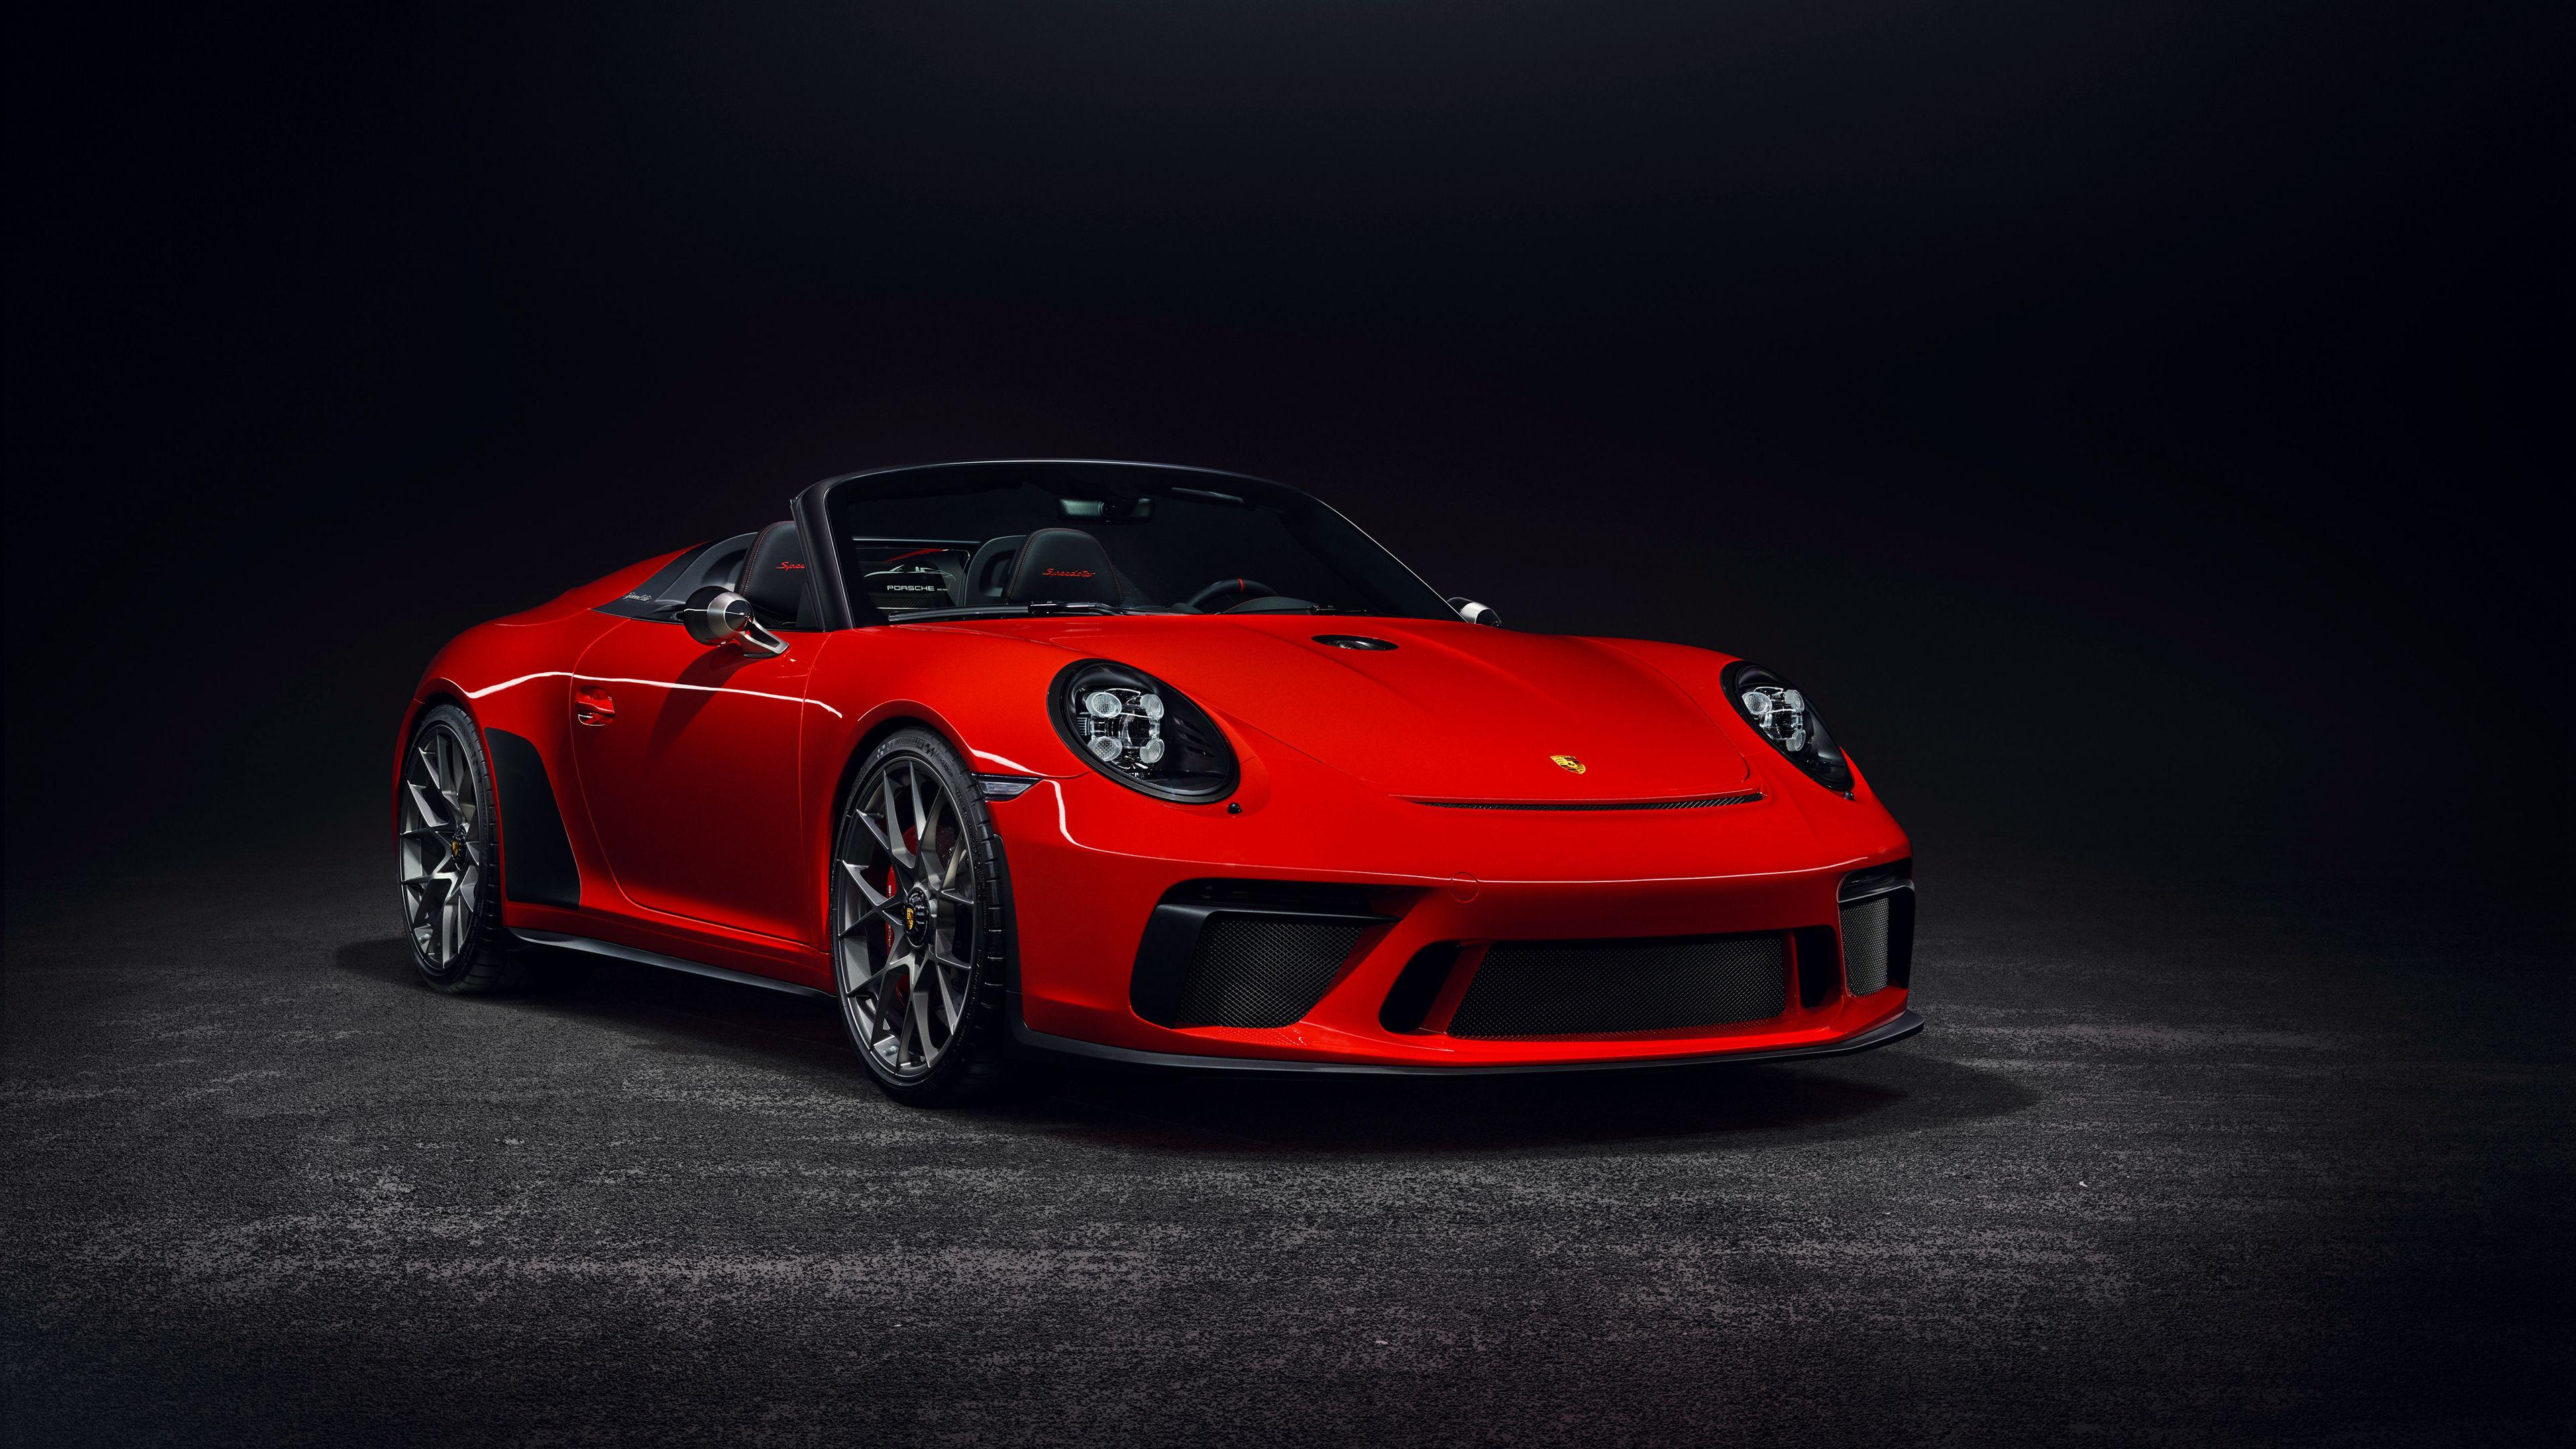 Porsche 911 Speedster Concept II 2018 porsche wallpapers, porsche 911 wallpapers…